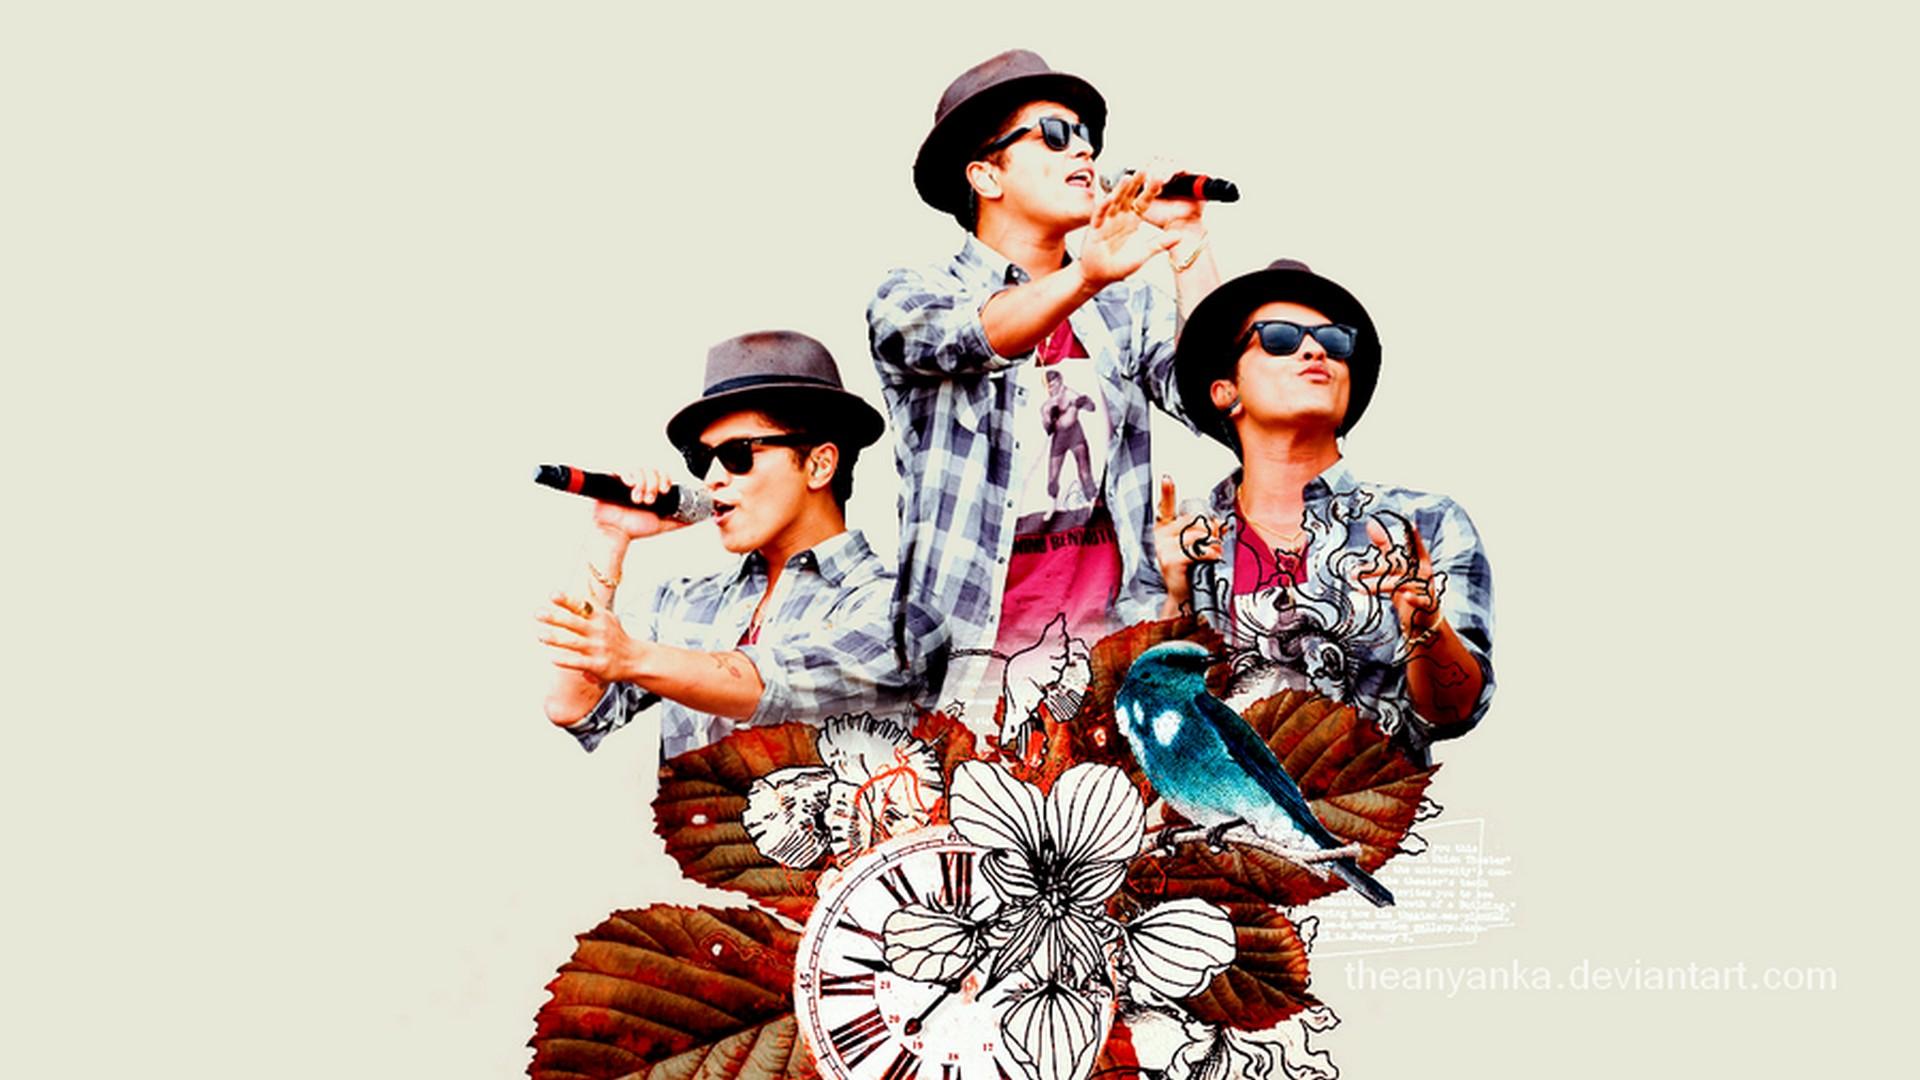 Free Download Bruno Mars Hd Wallpaper 2018 Live Wallpaper Hd 1920x1080 For Your Desktop Mobile Tablet Explore 99 Bruno Mars 2018 Wallpapers Bruno Mars 2018 Wallpapers Bruno Mars Wallpapers Bruno Mars Wallpaper